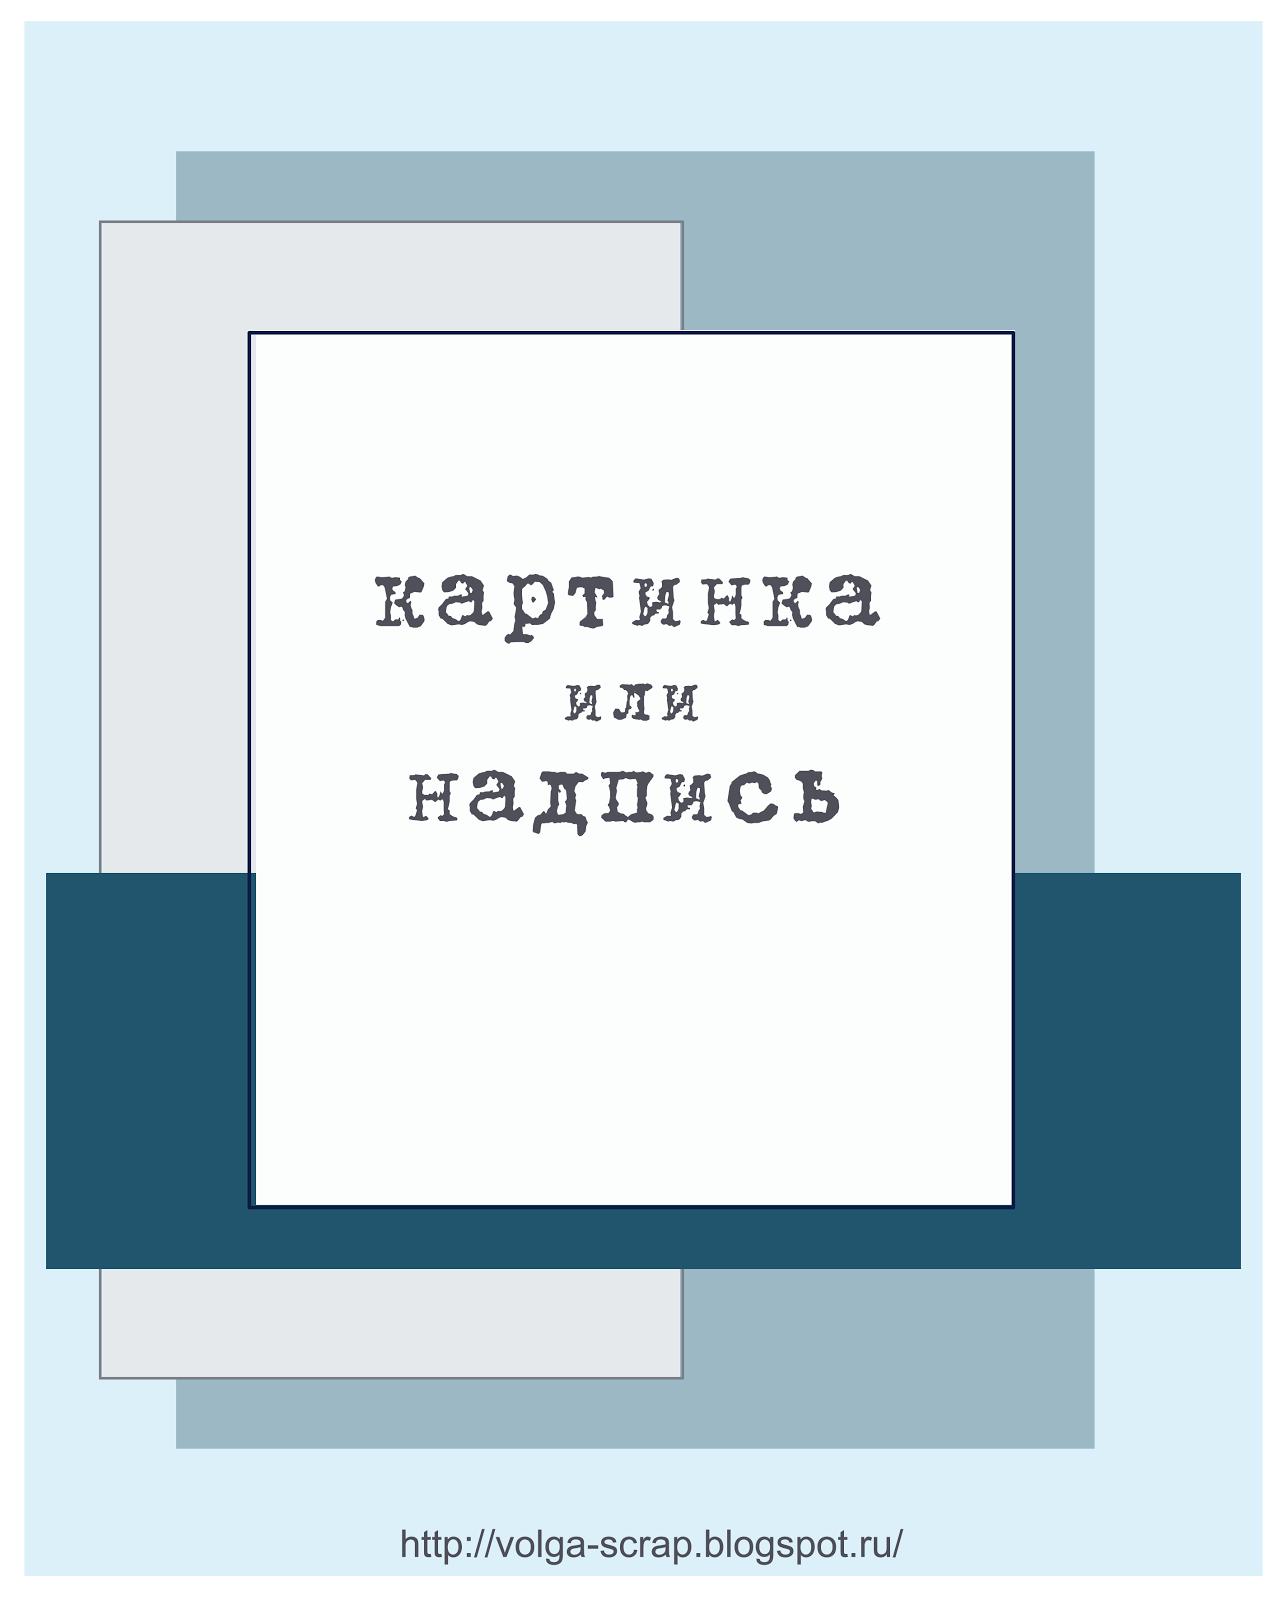 http://volga-scrap.blogspot.ru/2014/12/0812-0401.html